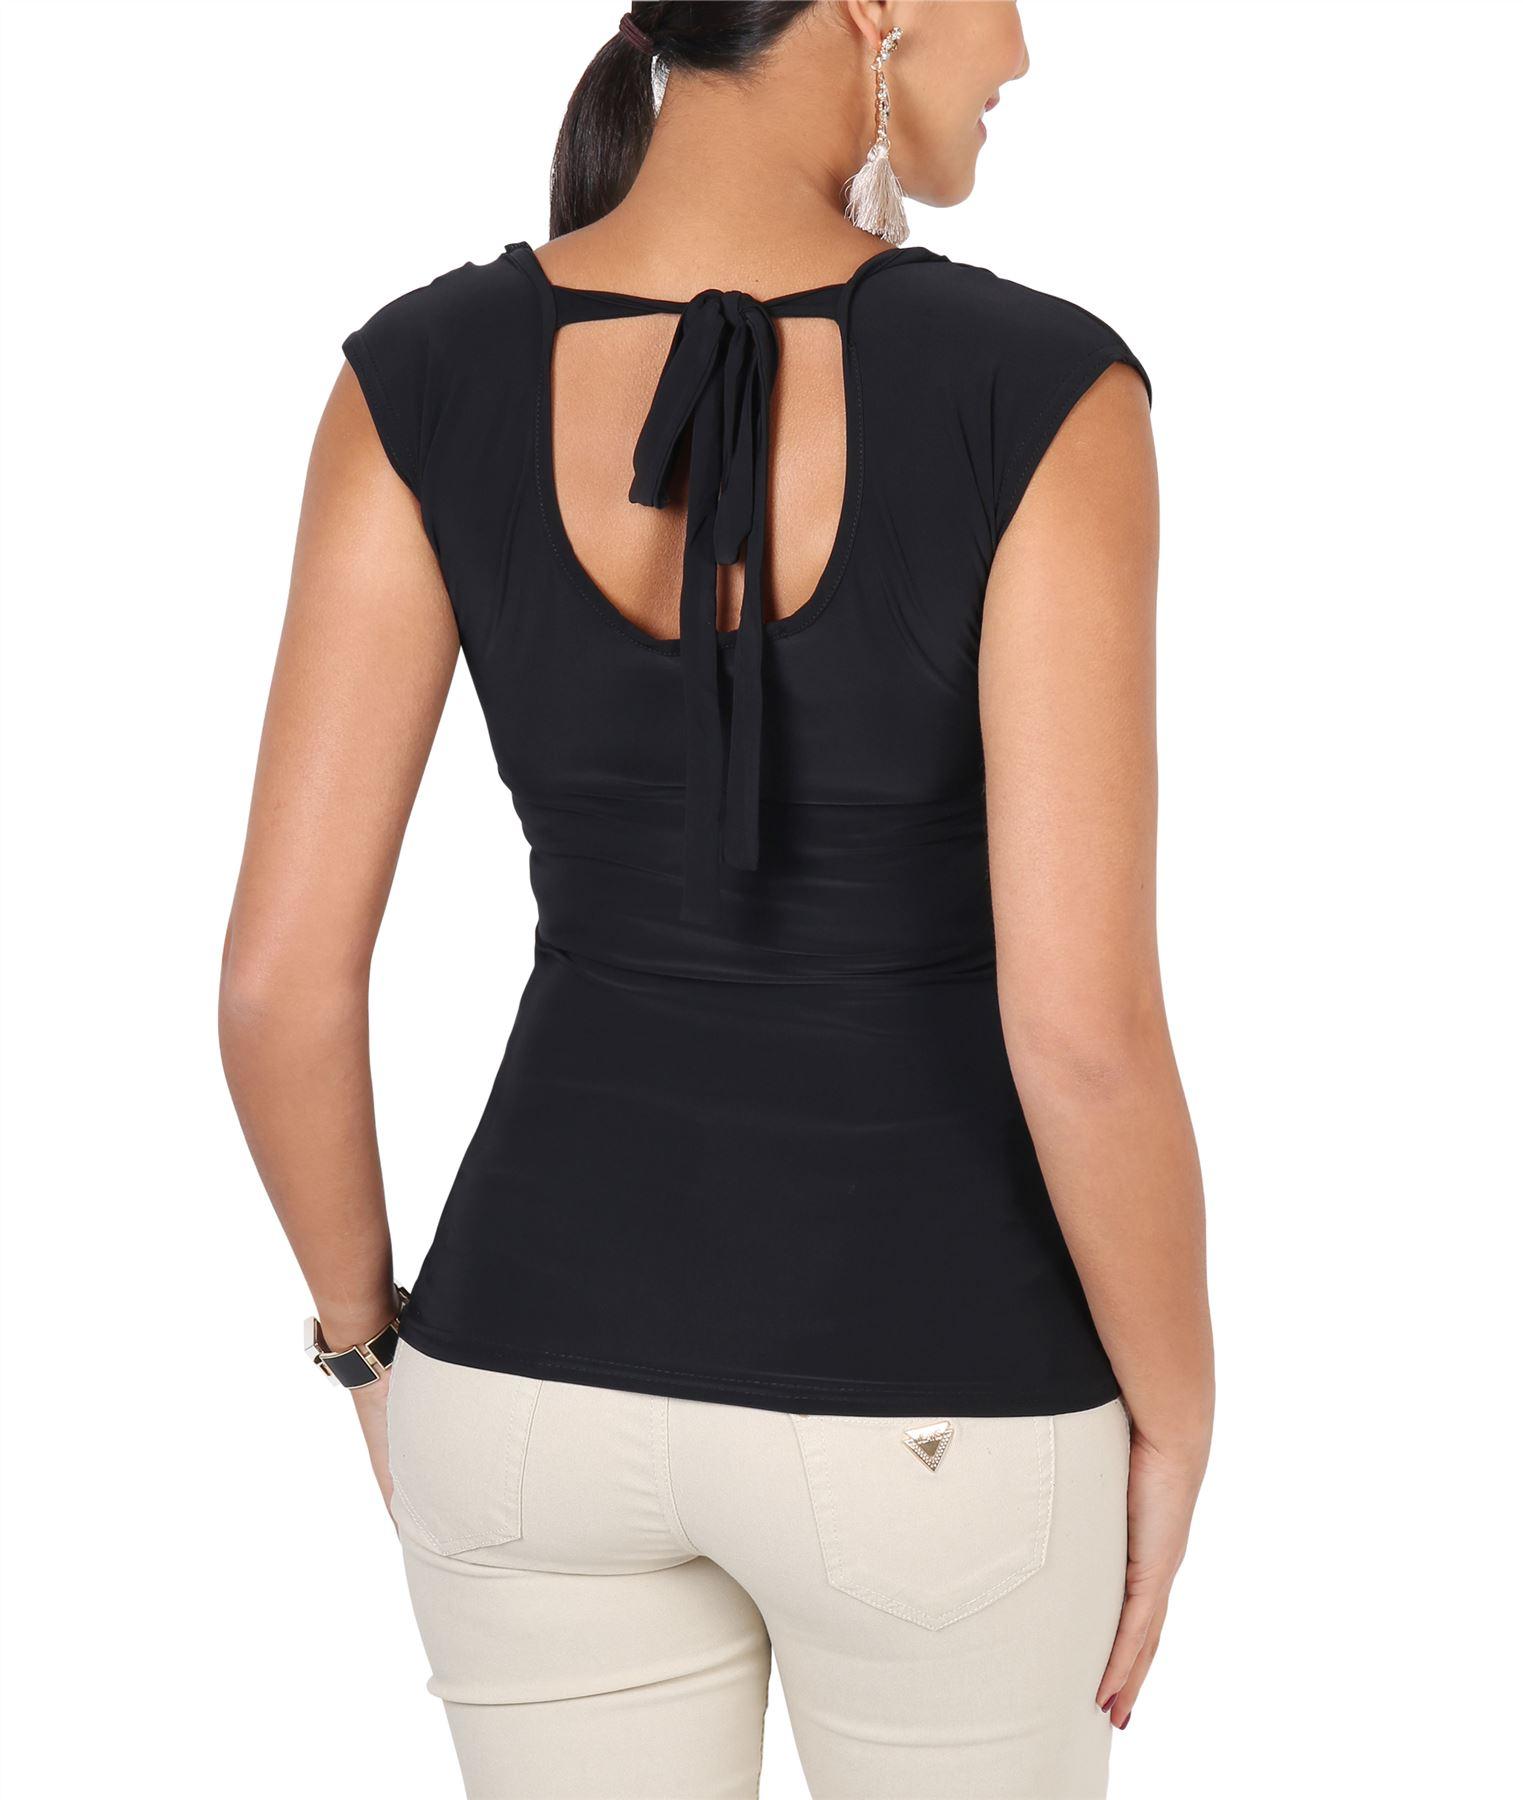 Womens-Ladies-Cowl-Neck-Top-Sleeveless-Silk-Drape-T-Shirt-Low-Cut-Back-Party thumbnail 5